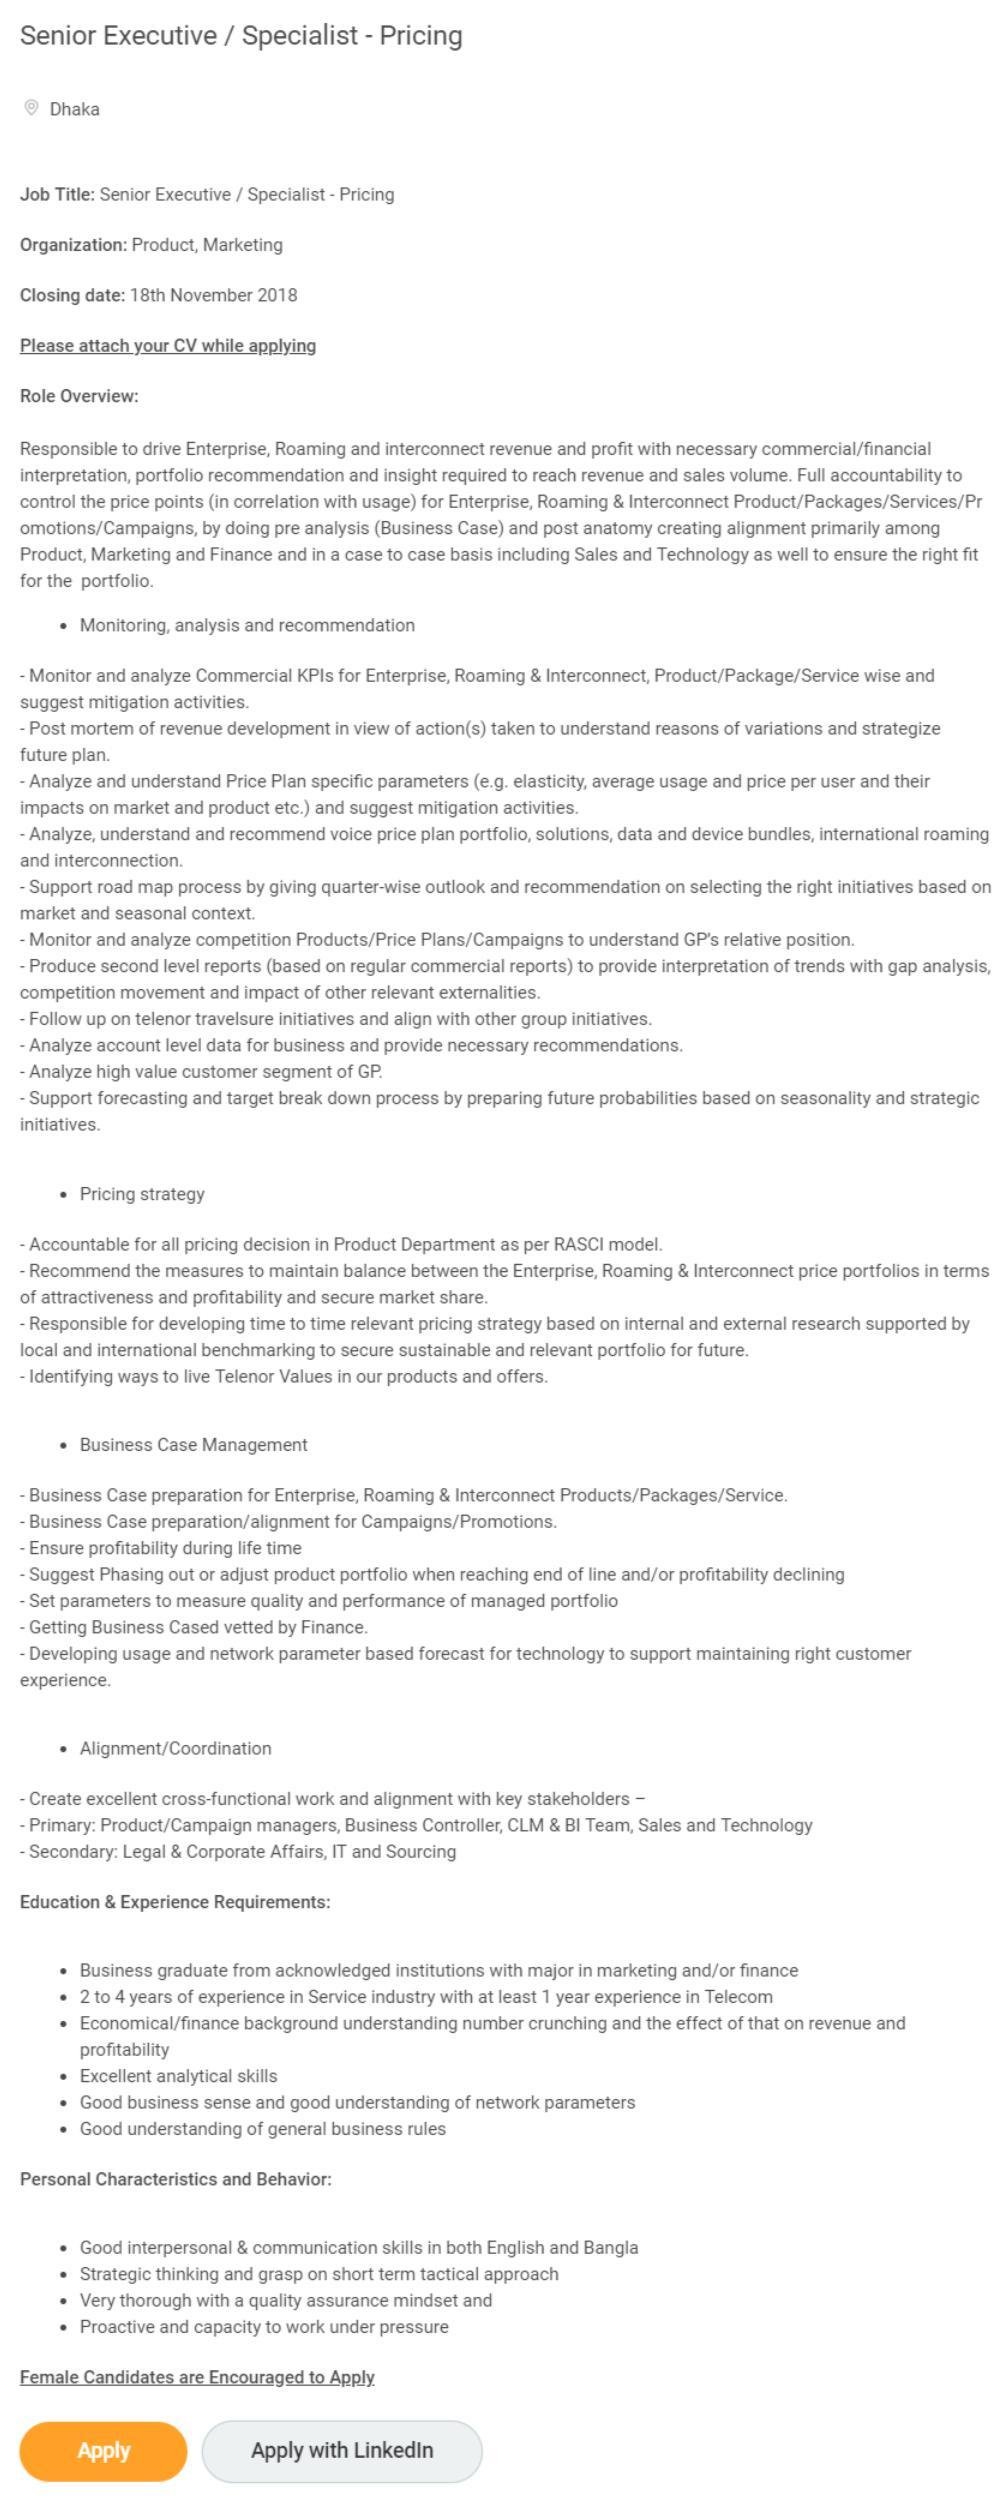 Grameenphone Job Circular 2018 - Apply Online